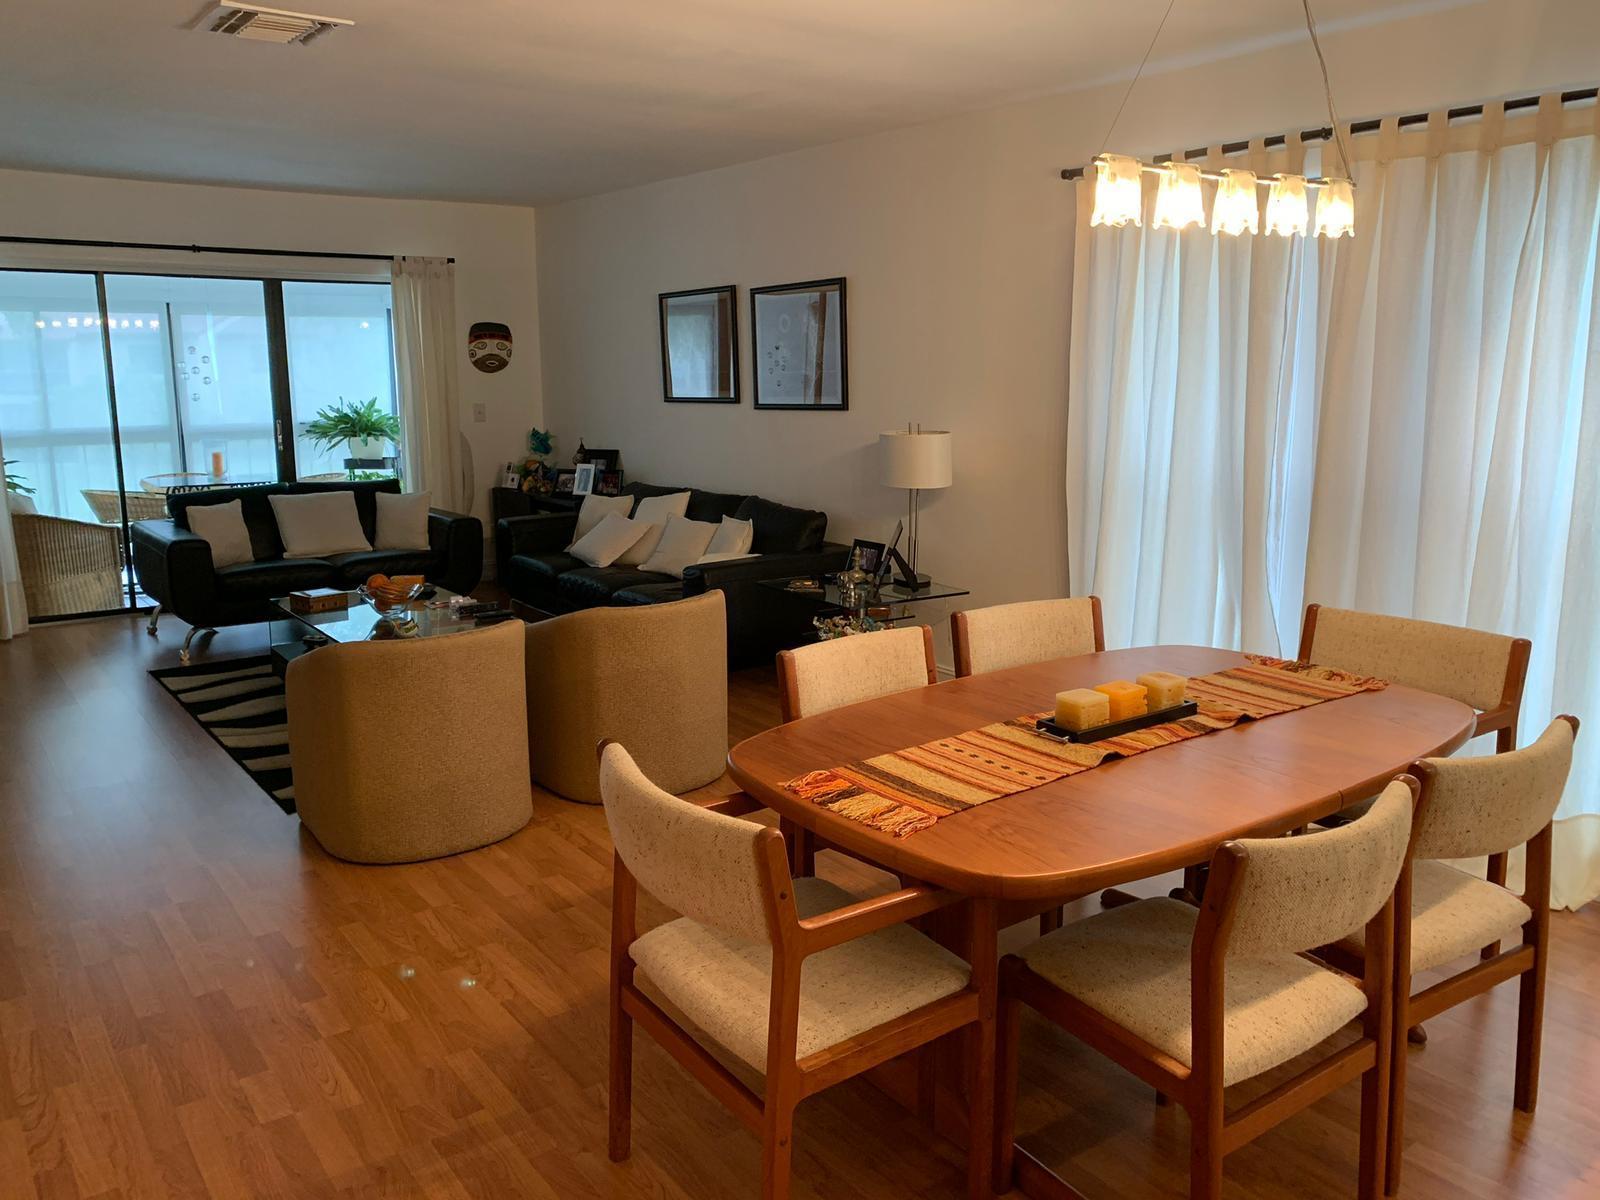 21364 Cypress Hammock Drive, Boca Raton, Florida 33428, 2 Bedrooms Bedrooms, ,2 BathroomsBathrooms,Rental,For Rent,Cypress Hammock,RX-10664671